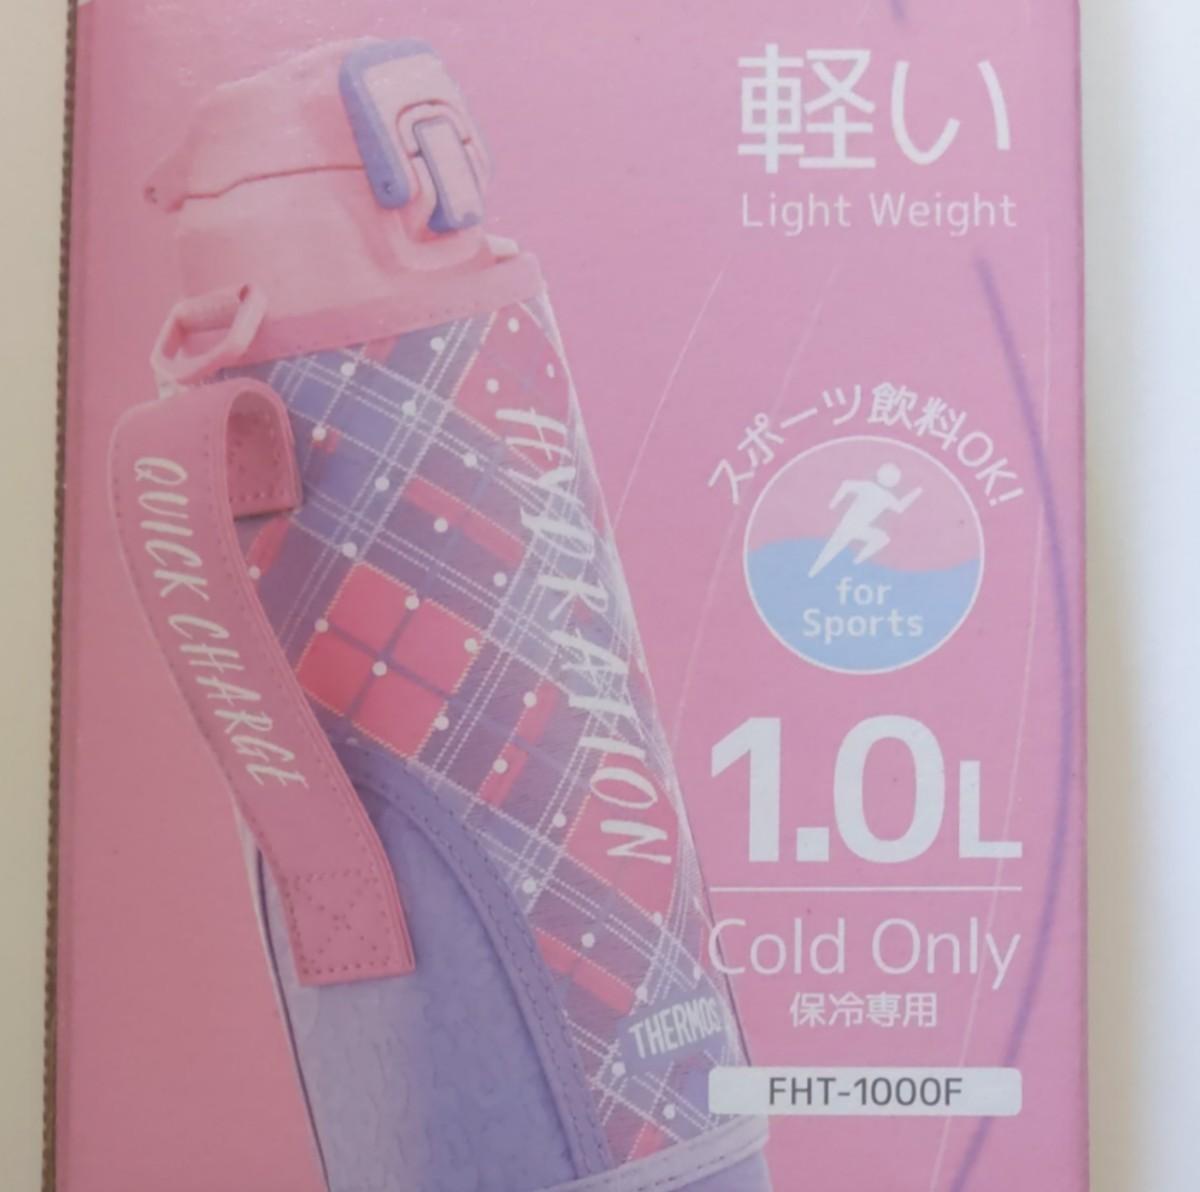 THERMOS サーモス  真空断熱 スポーツボトル 1.0L 水筒  サーモス水筒